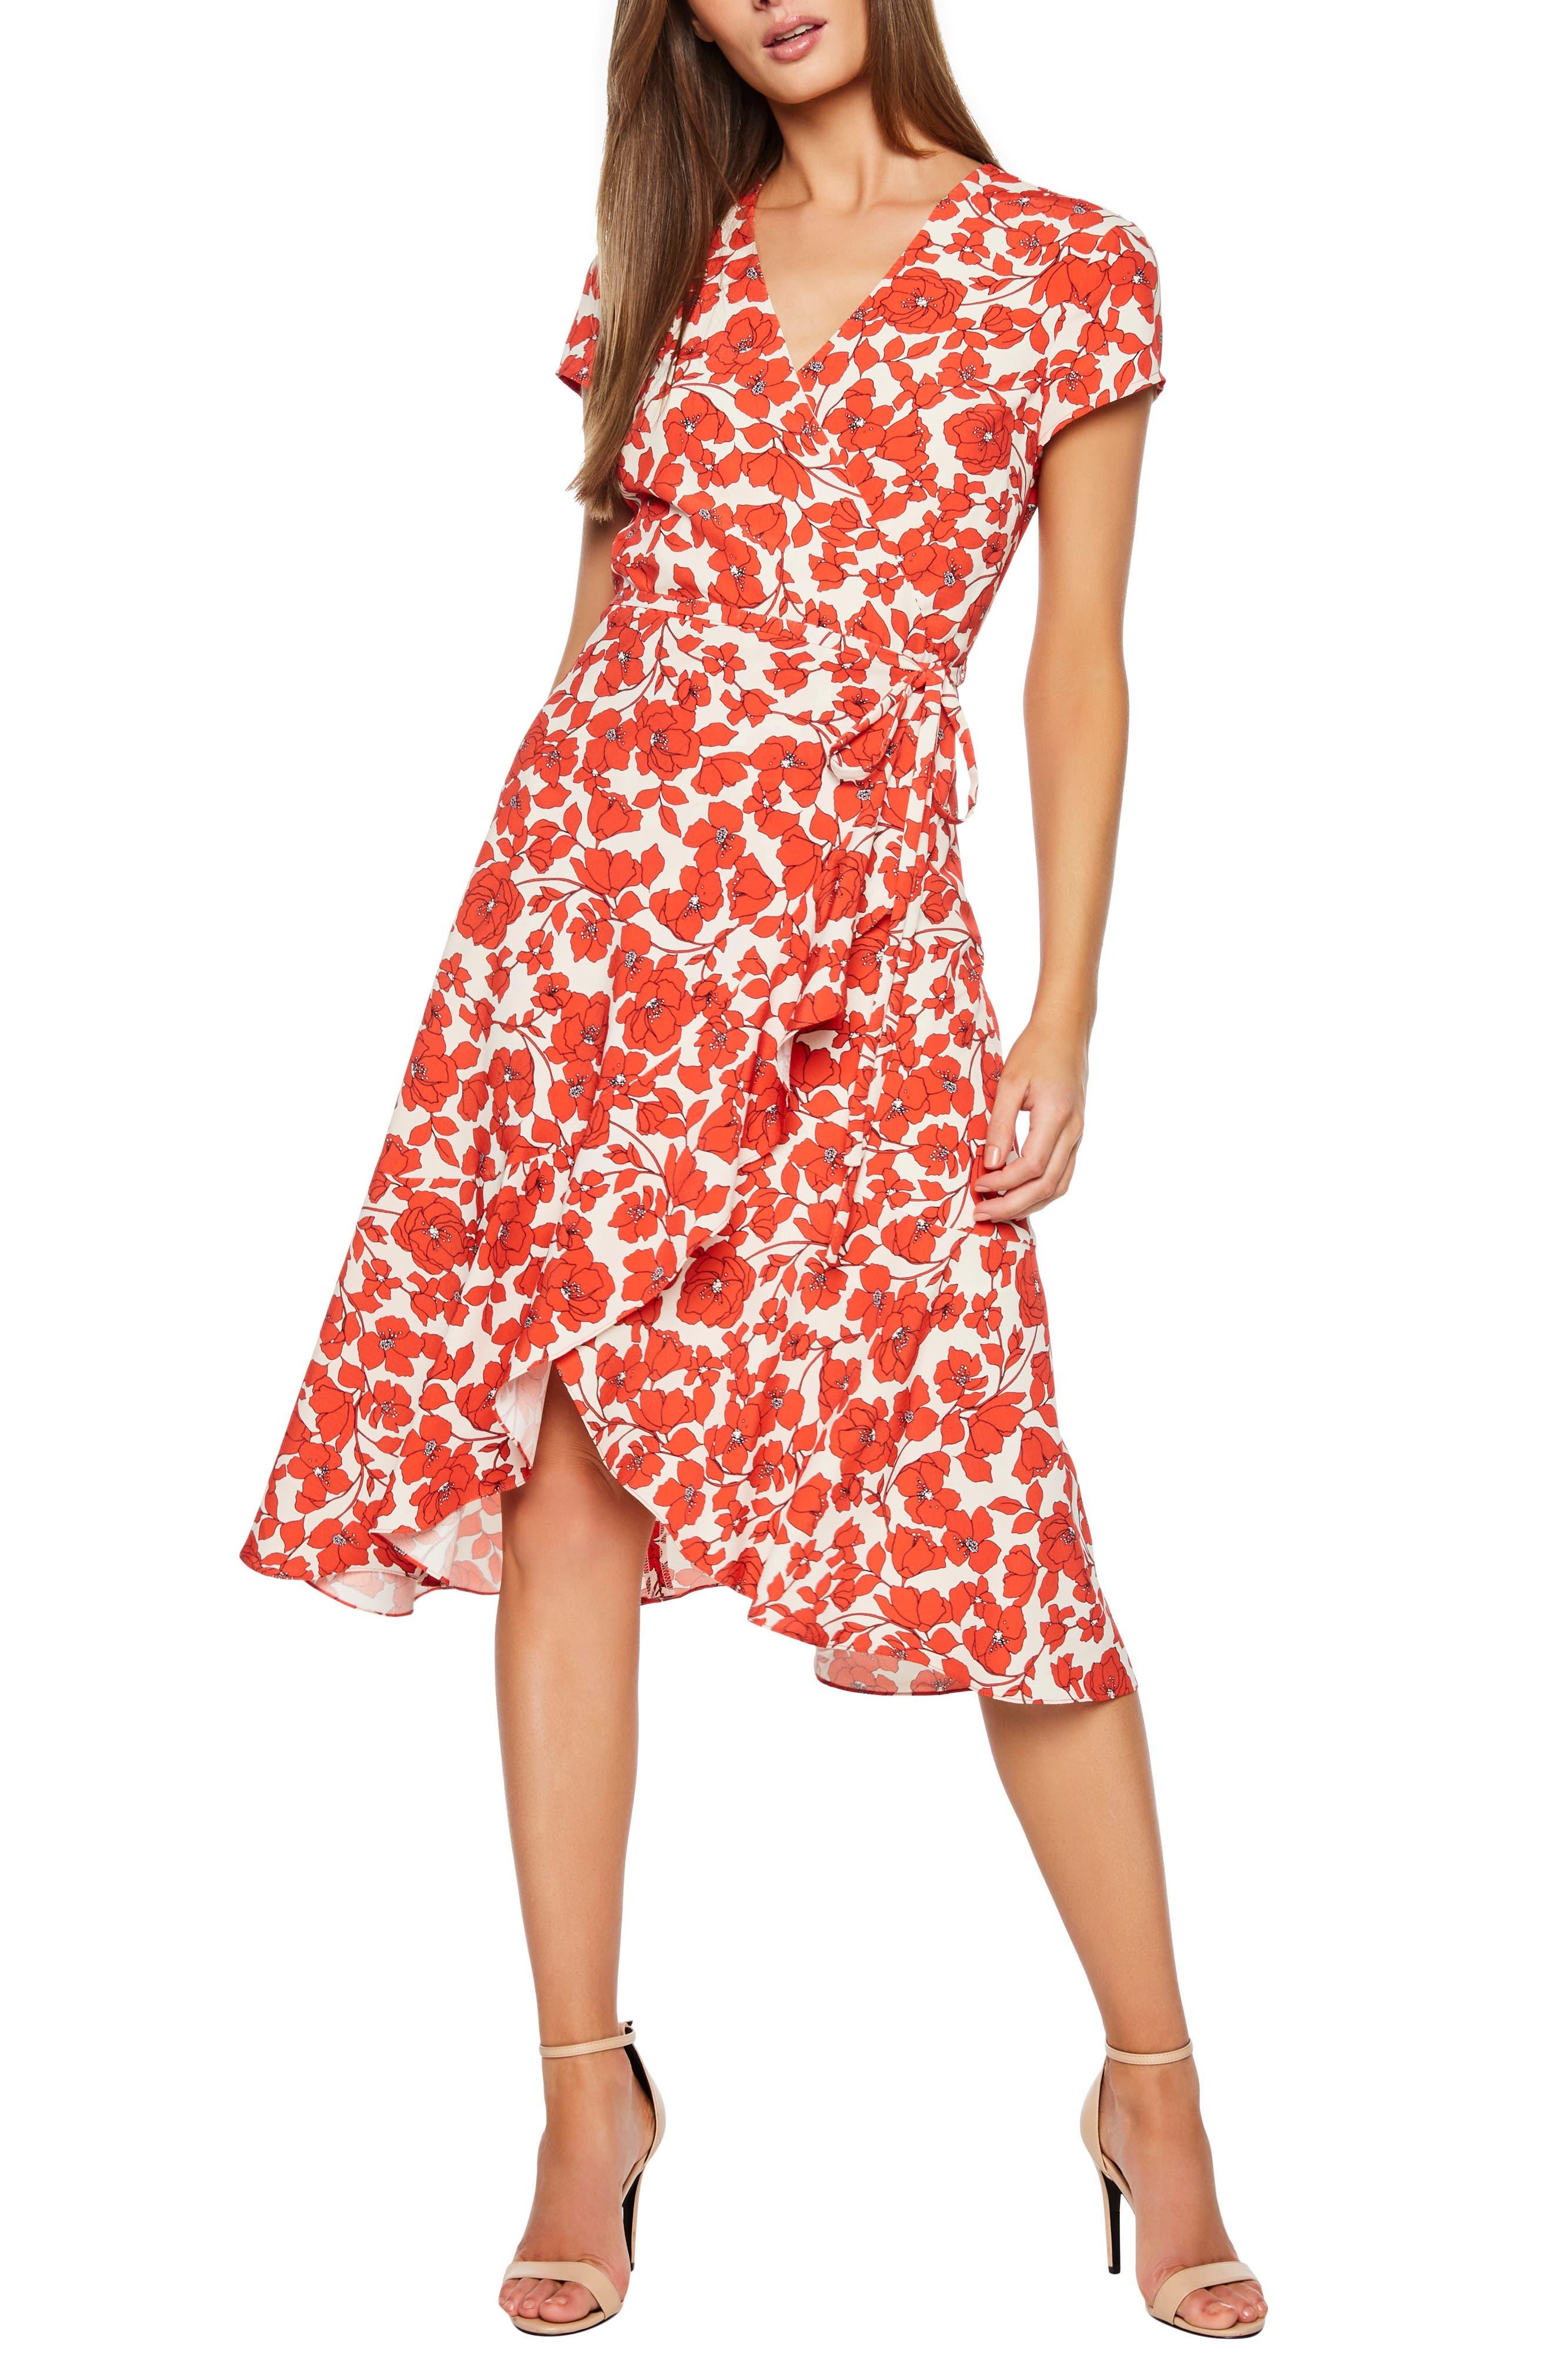 BARDOT Fiesta Floral Midi Dress, Main, color, 800